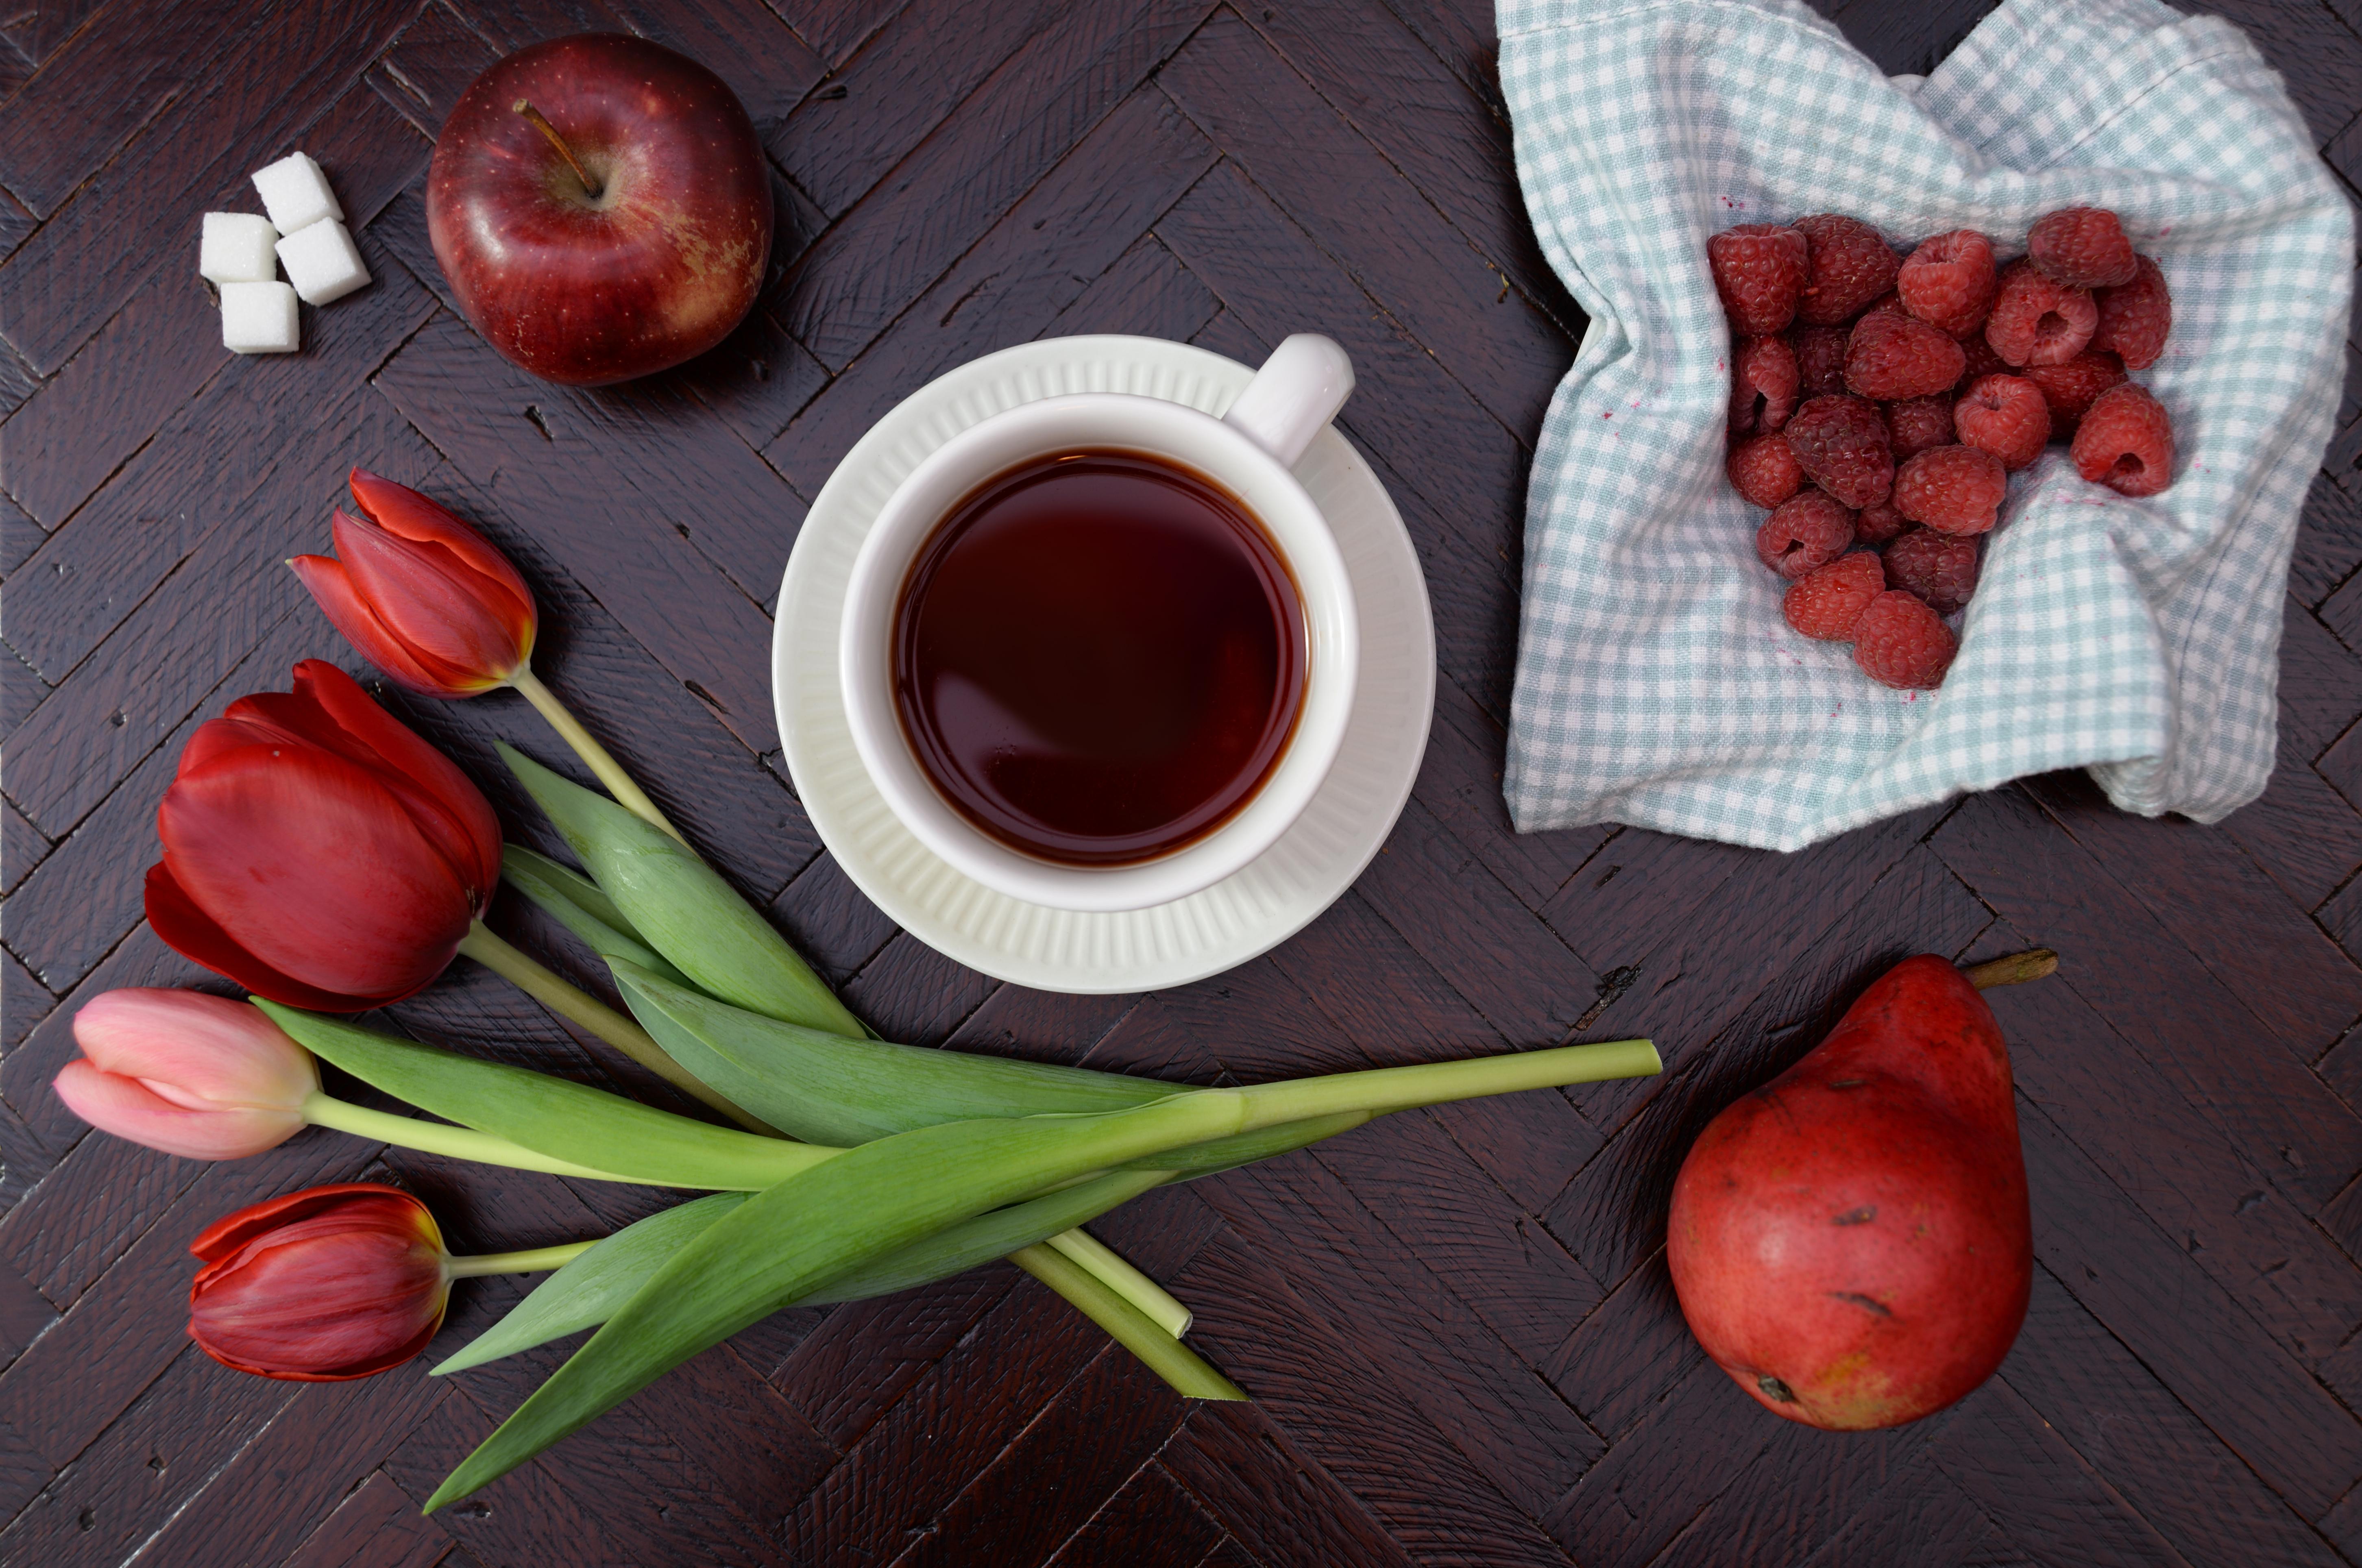 Kostenlose foto : Apfel, Tabelle, blühen, Frucht, Blume, Blütenblatt ...